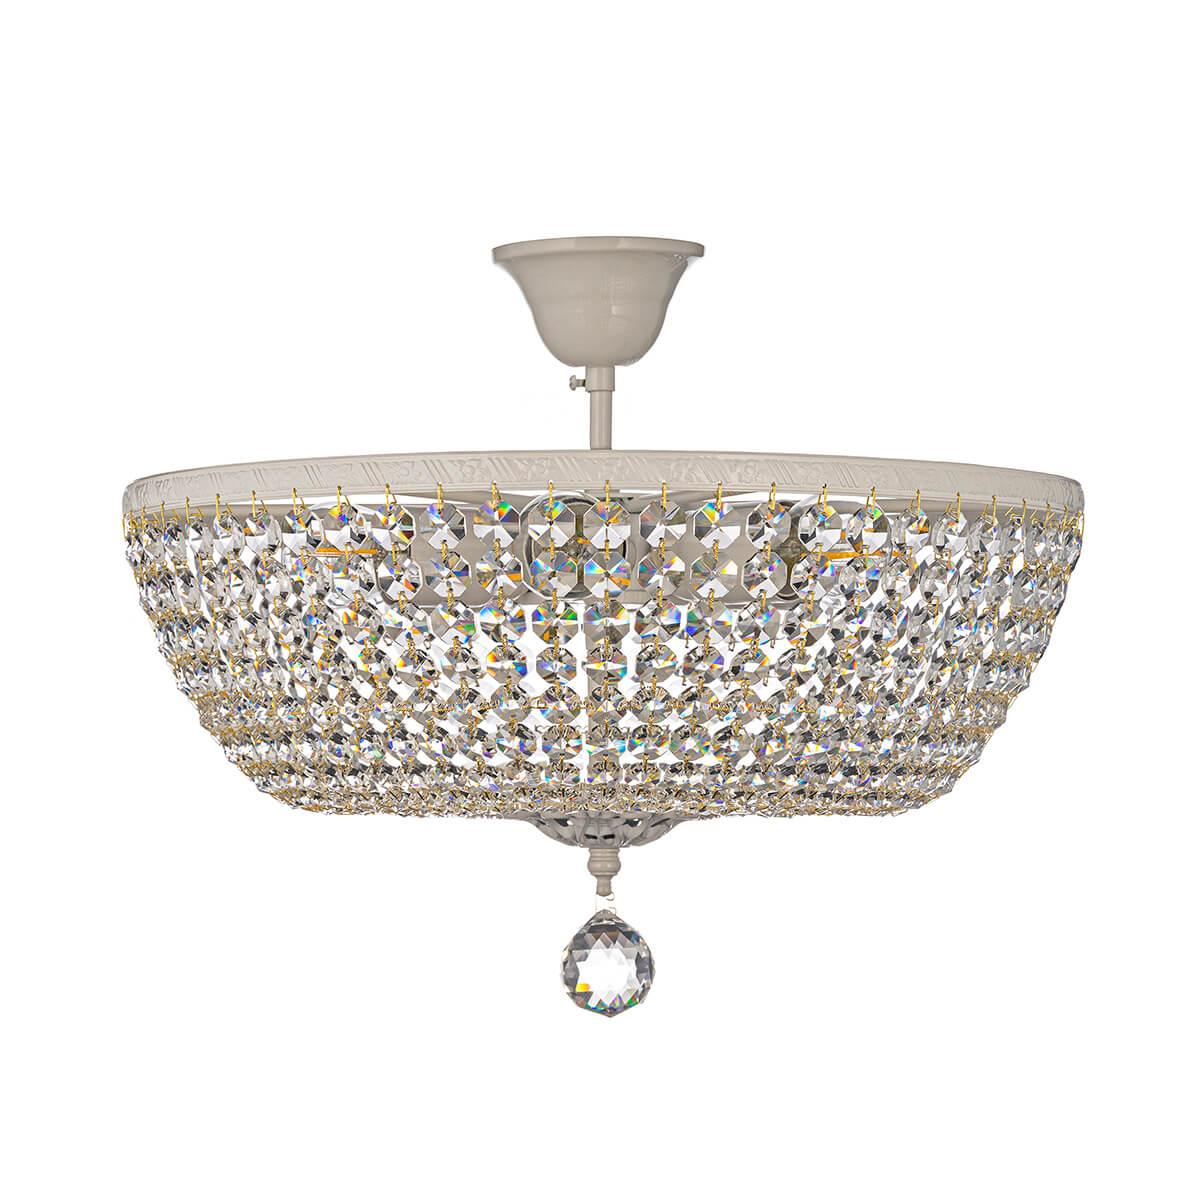 Потолочный светильник Arti Lampadari Nobile E 1.3.40.2.100 WG